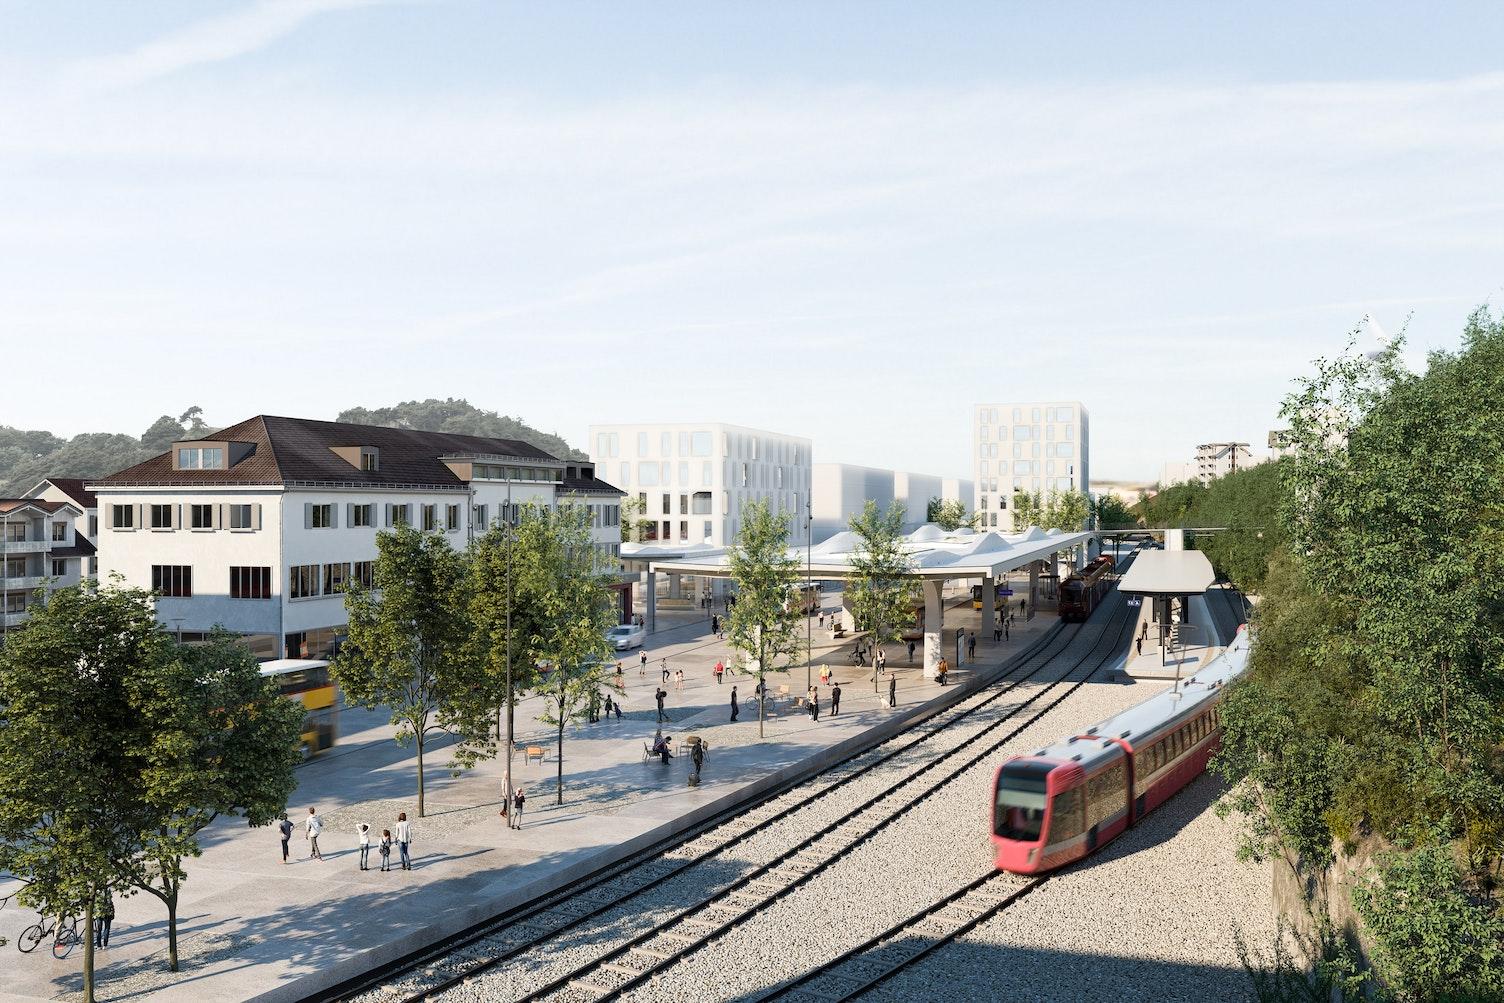 Bahnhof Herisau